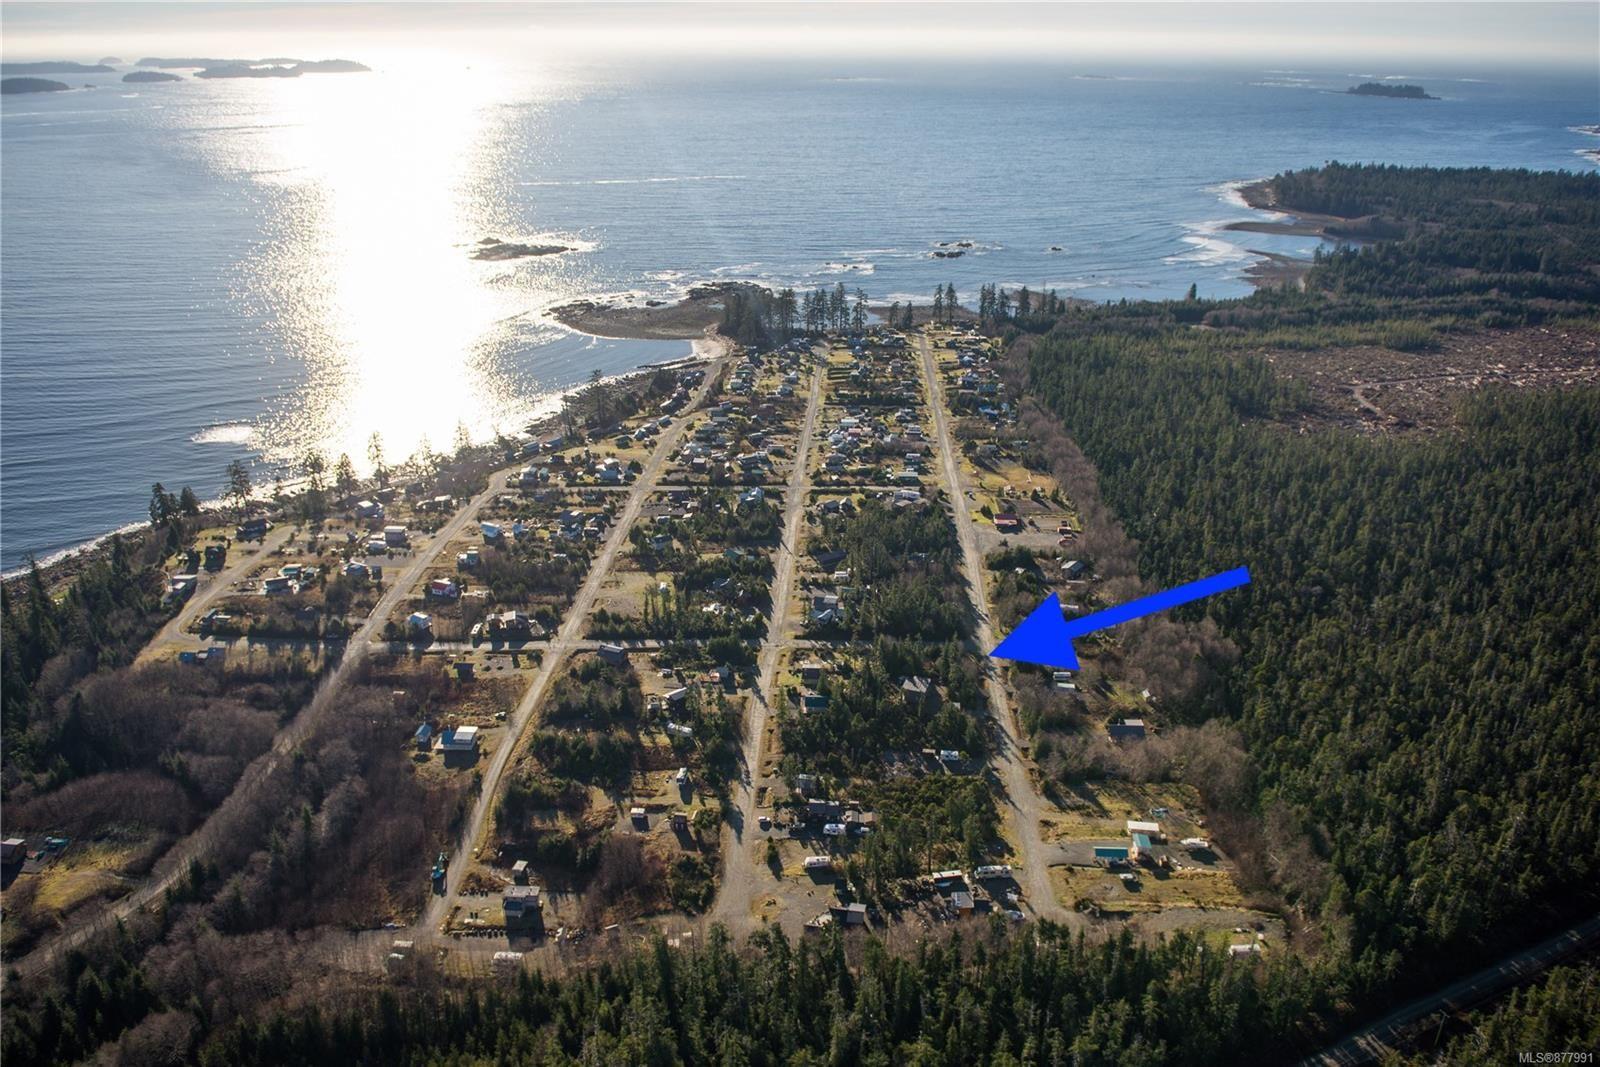 Main Photo: 1154 7th Ave in : PA Salmon Beach Land for sale (Port Alberni)  : MLS®# 877991